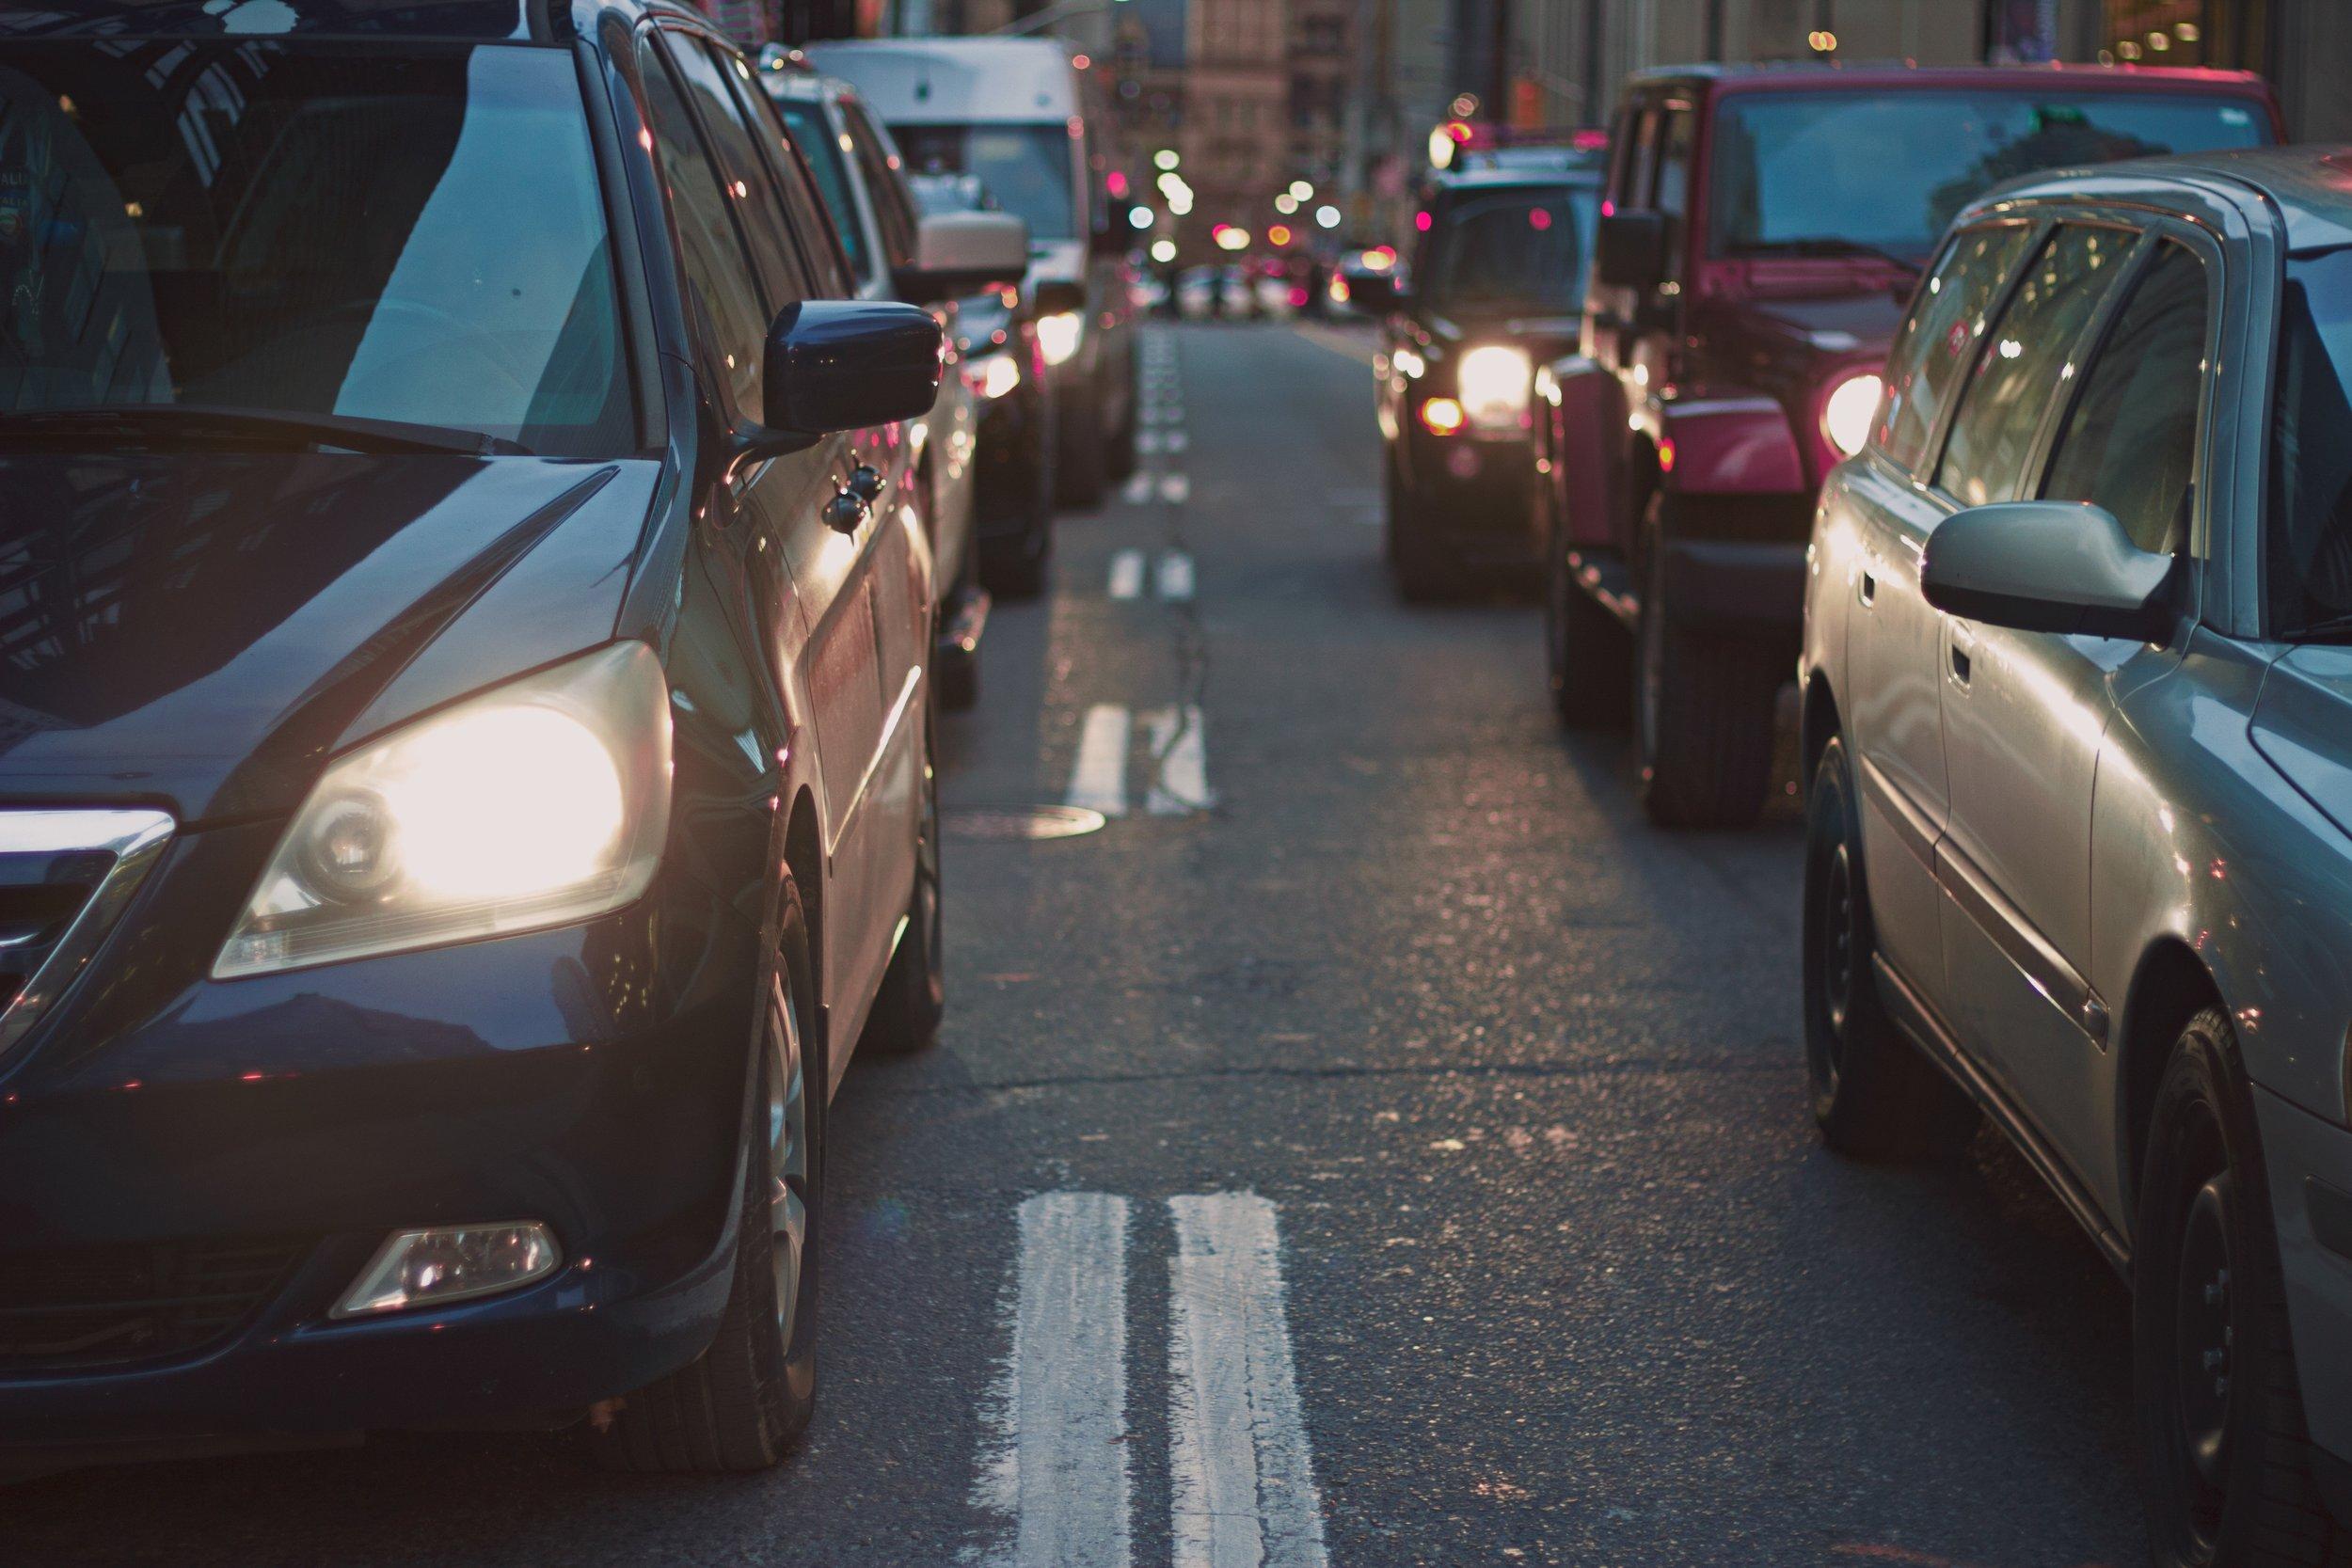 traffic jam, cars, congestion.jpg